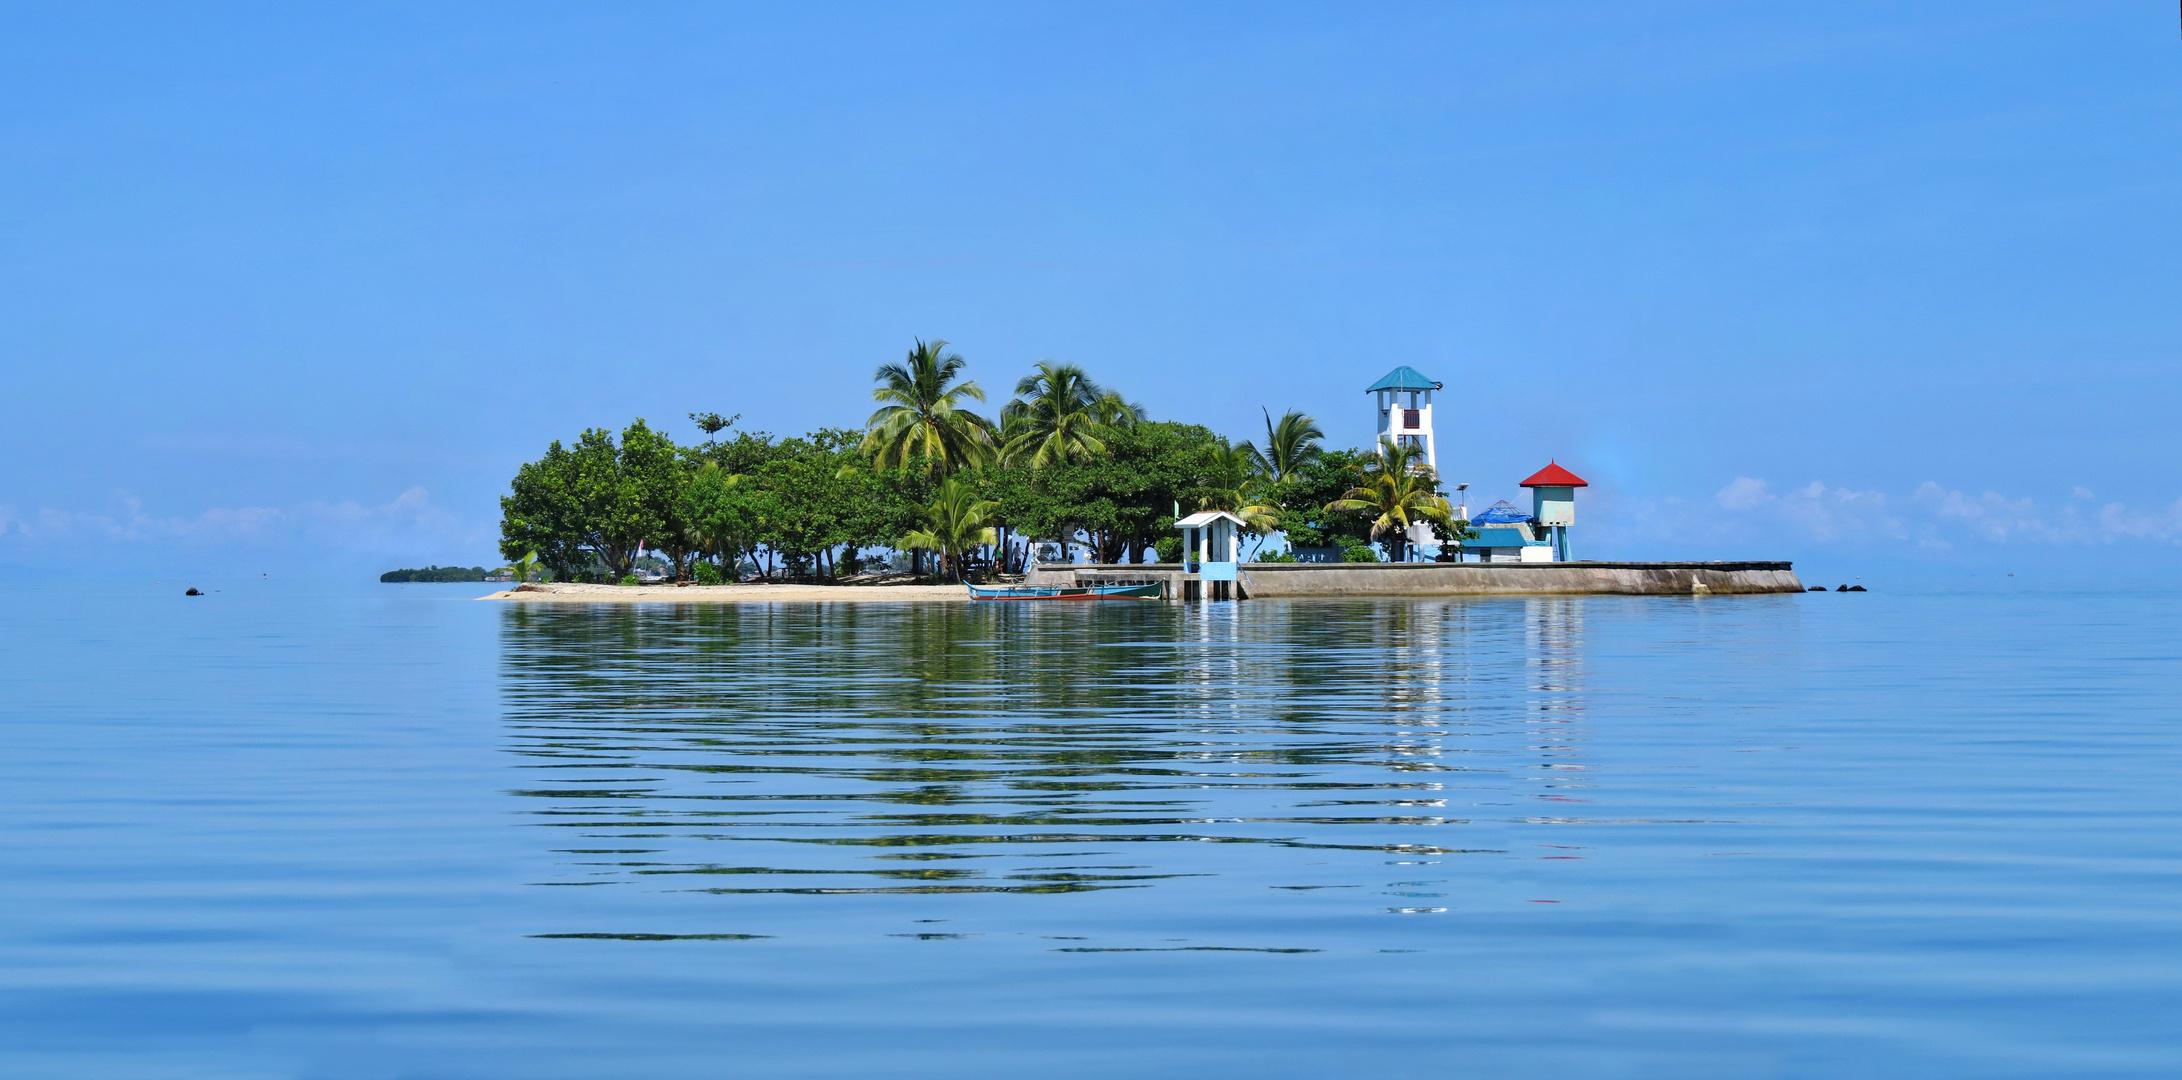 Pearl Island in Guiuan, Eatern Samar, Philippinen.